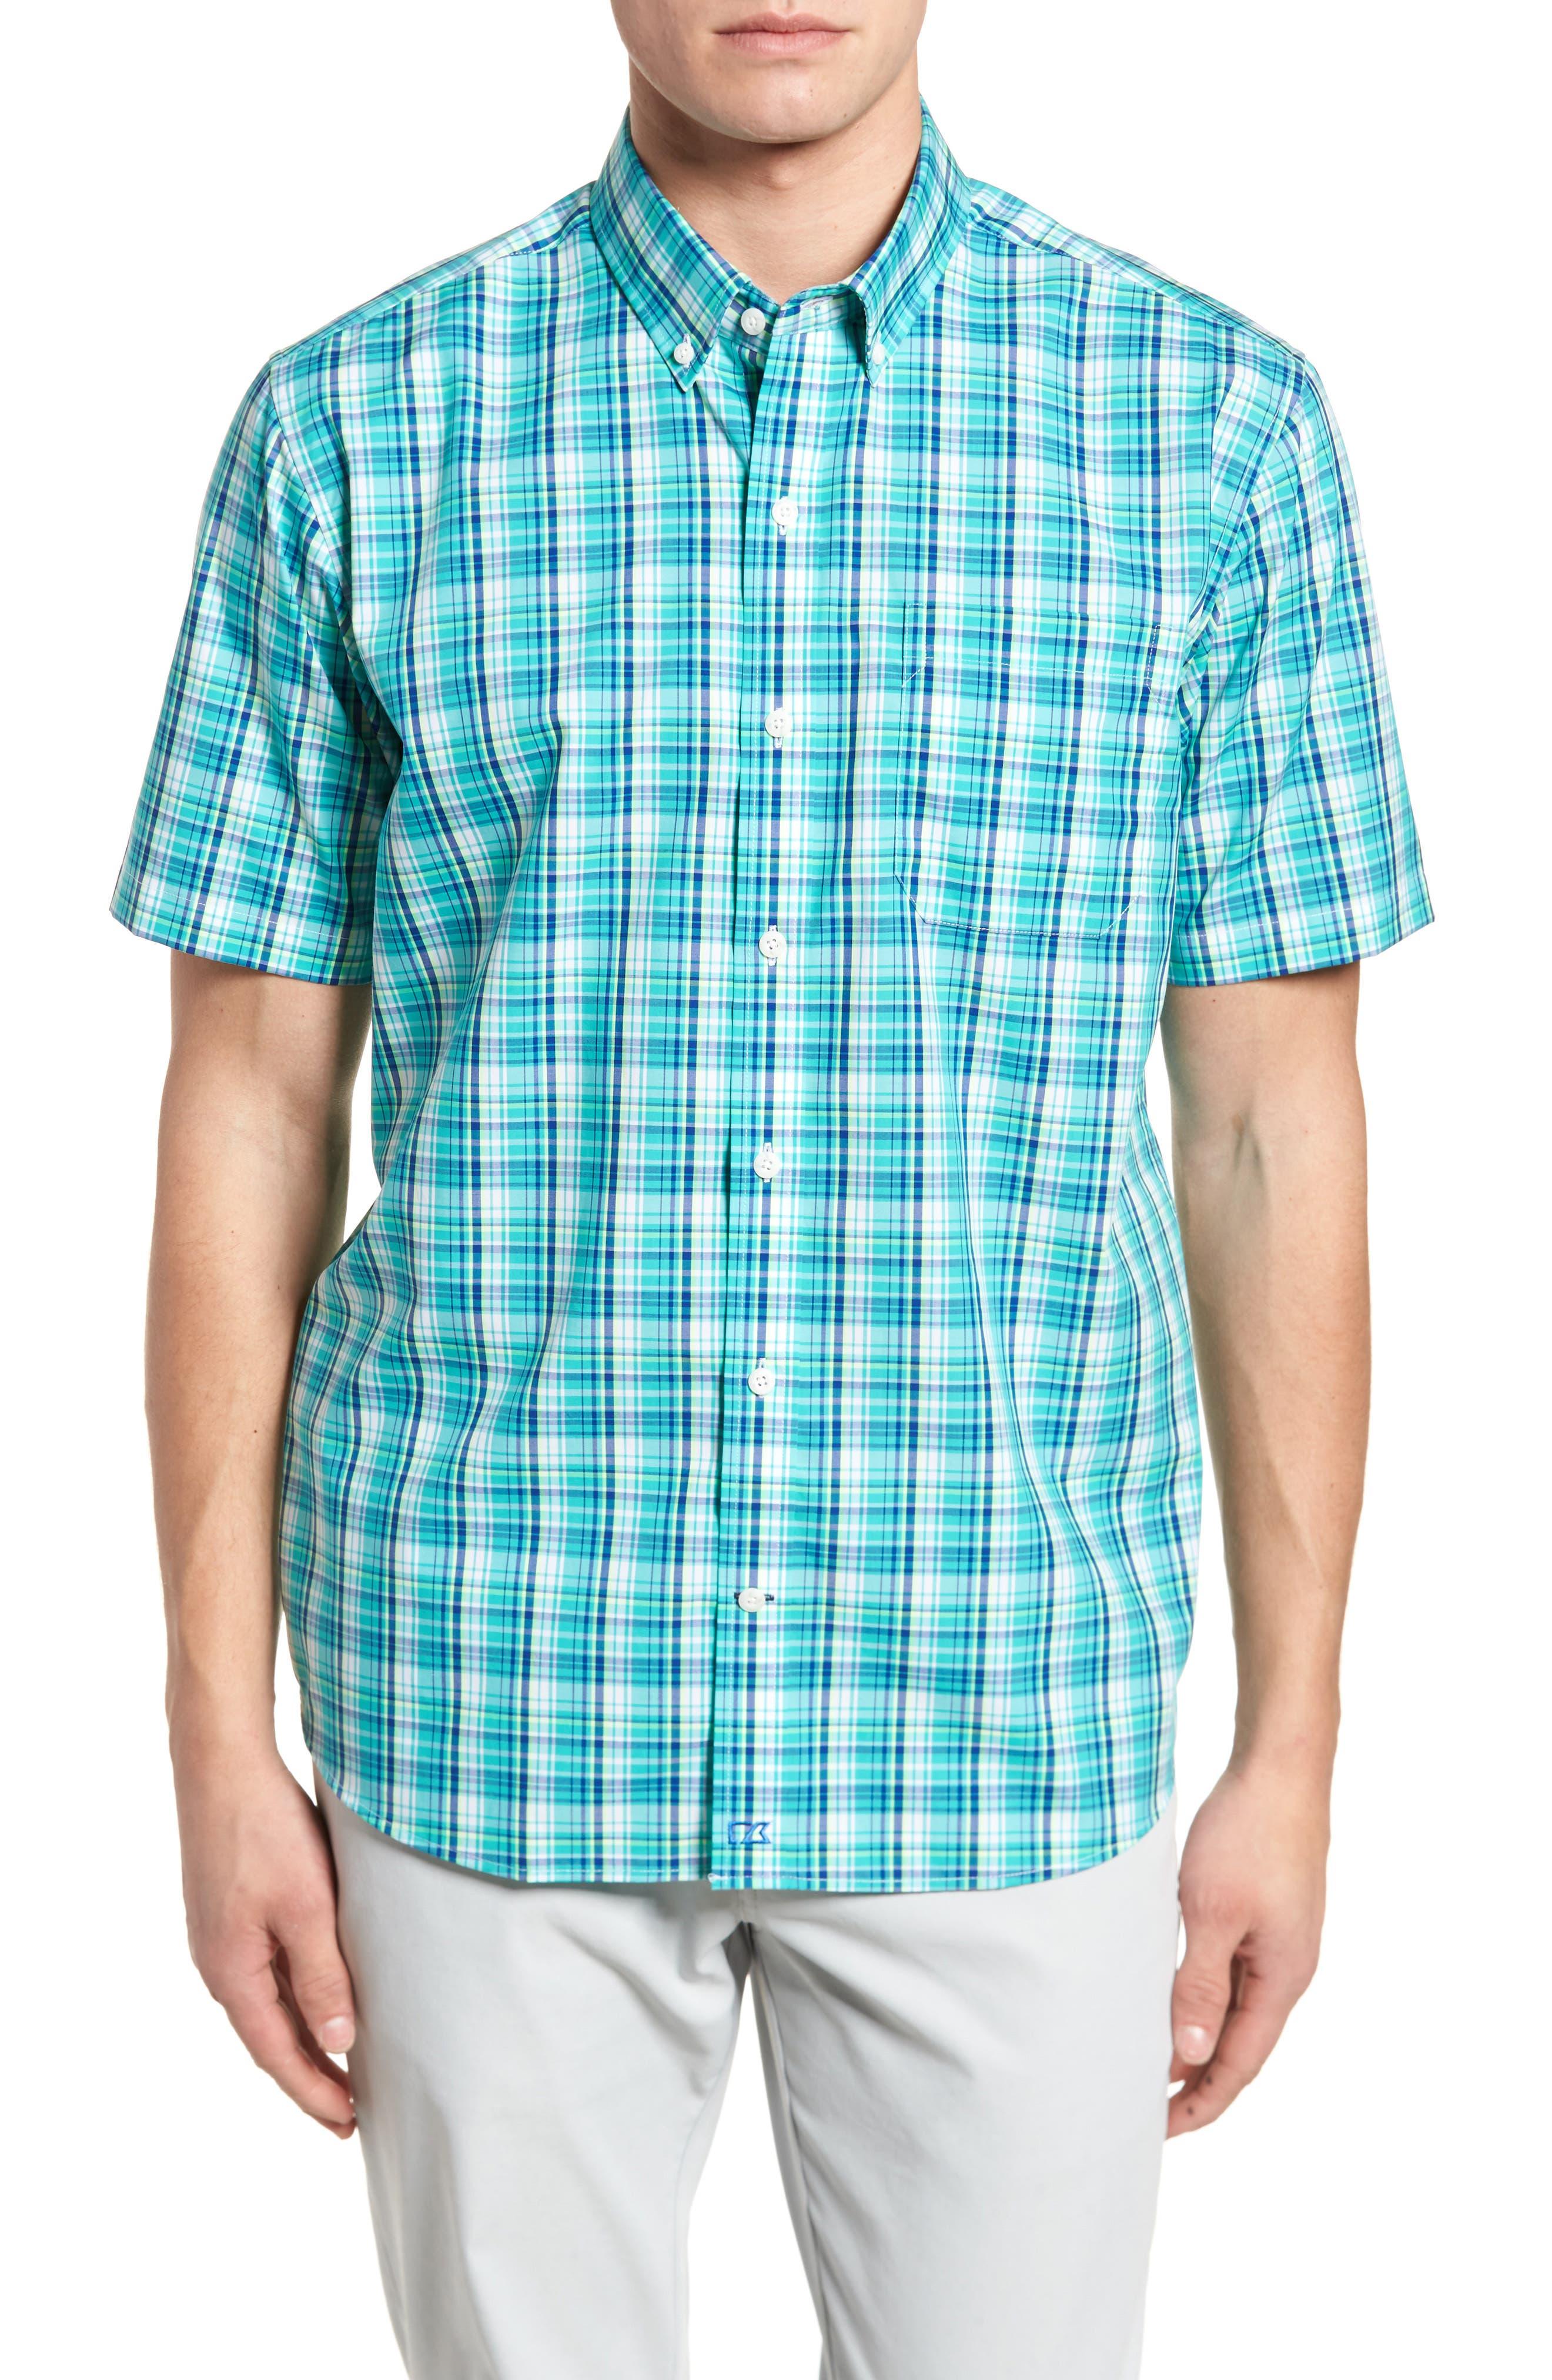 Tobias Non-Iron Plaid Woven Shirt,                             Main thumbnail 1, color,                             Newport